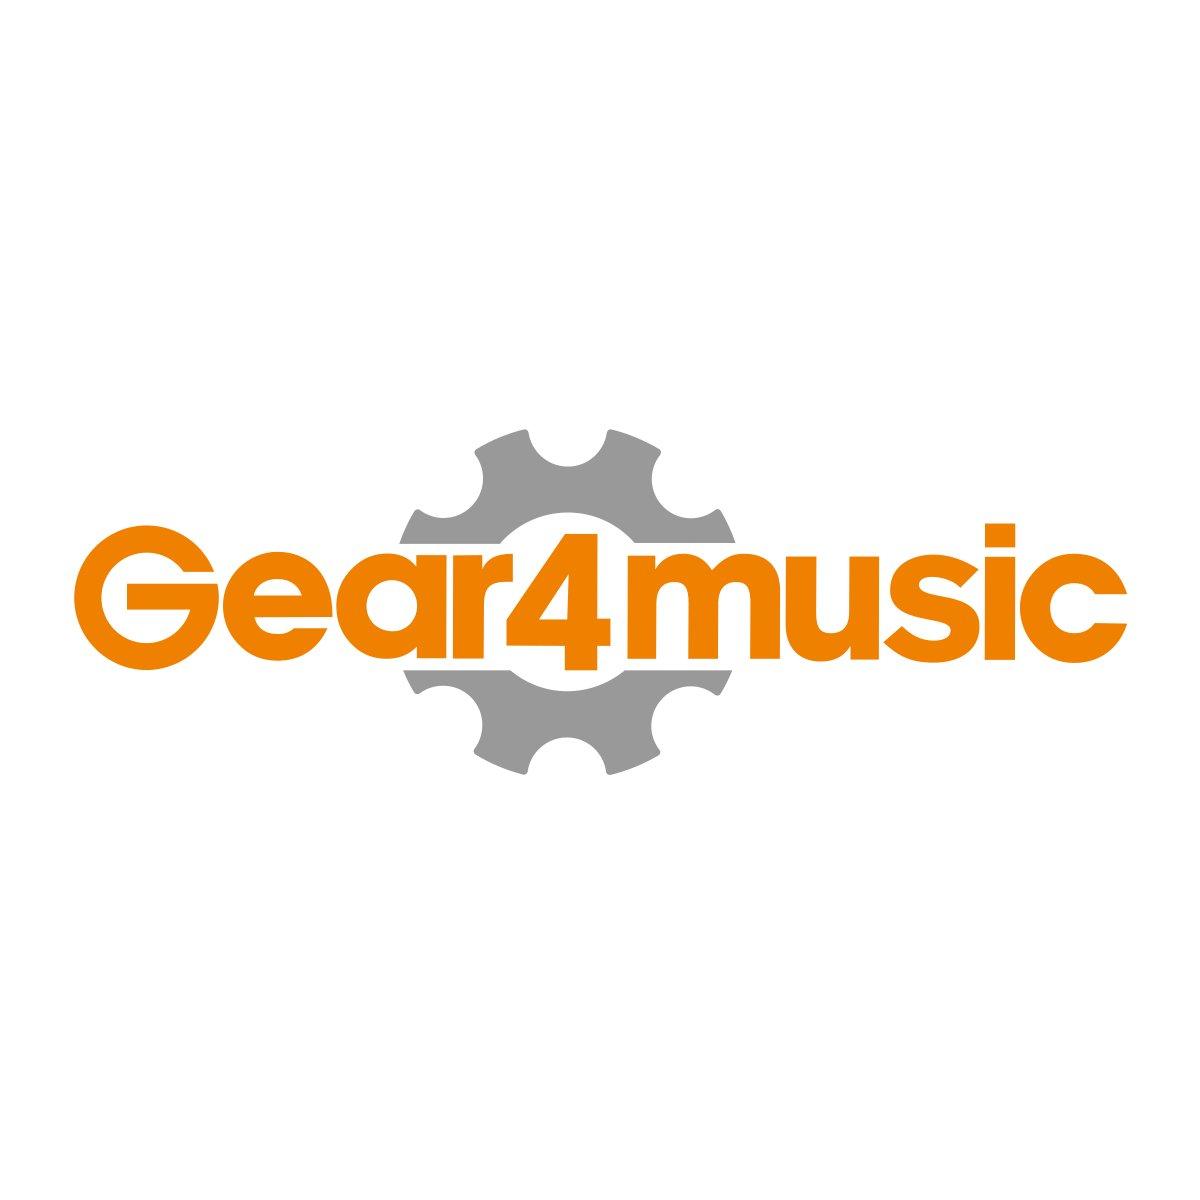 fishman rare earth humbucking soundhole acoustic pickup at gear4music. Black Bedroom Furniture Sets. Home Design Ideas